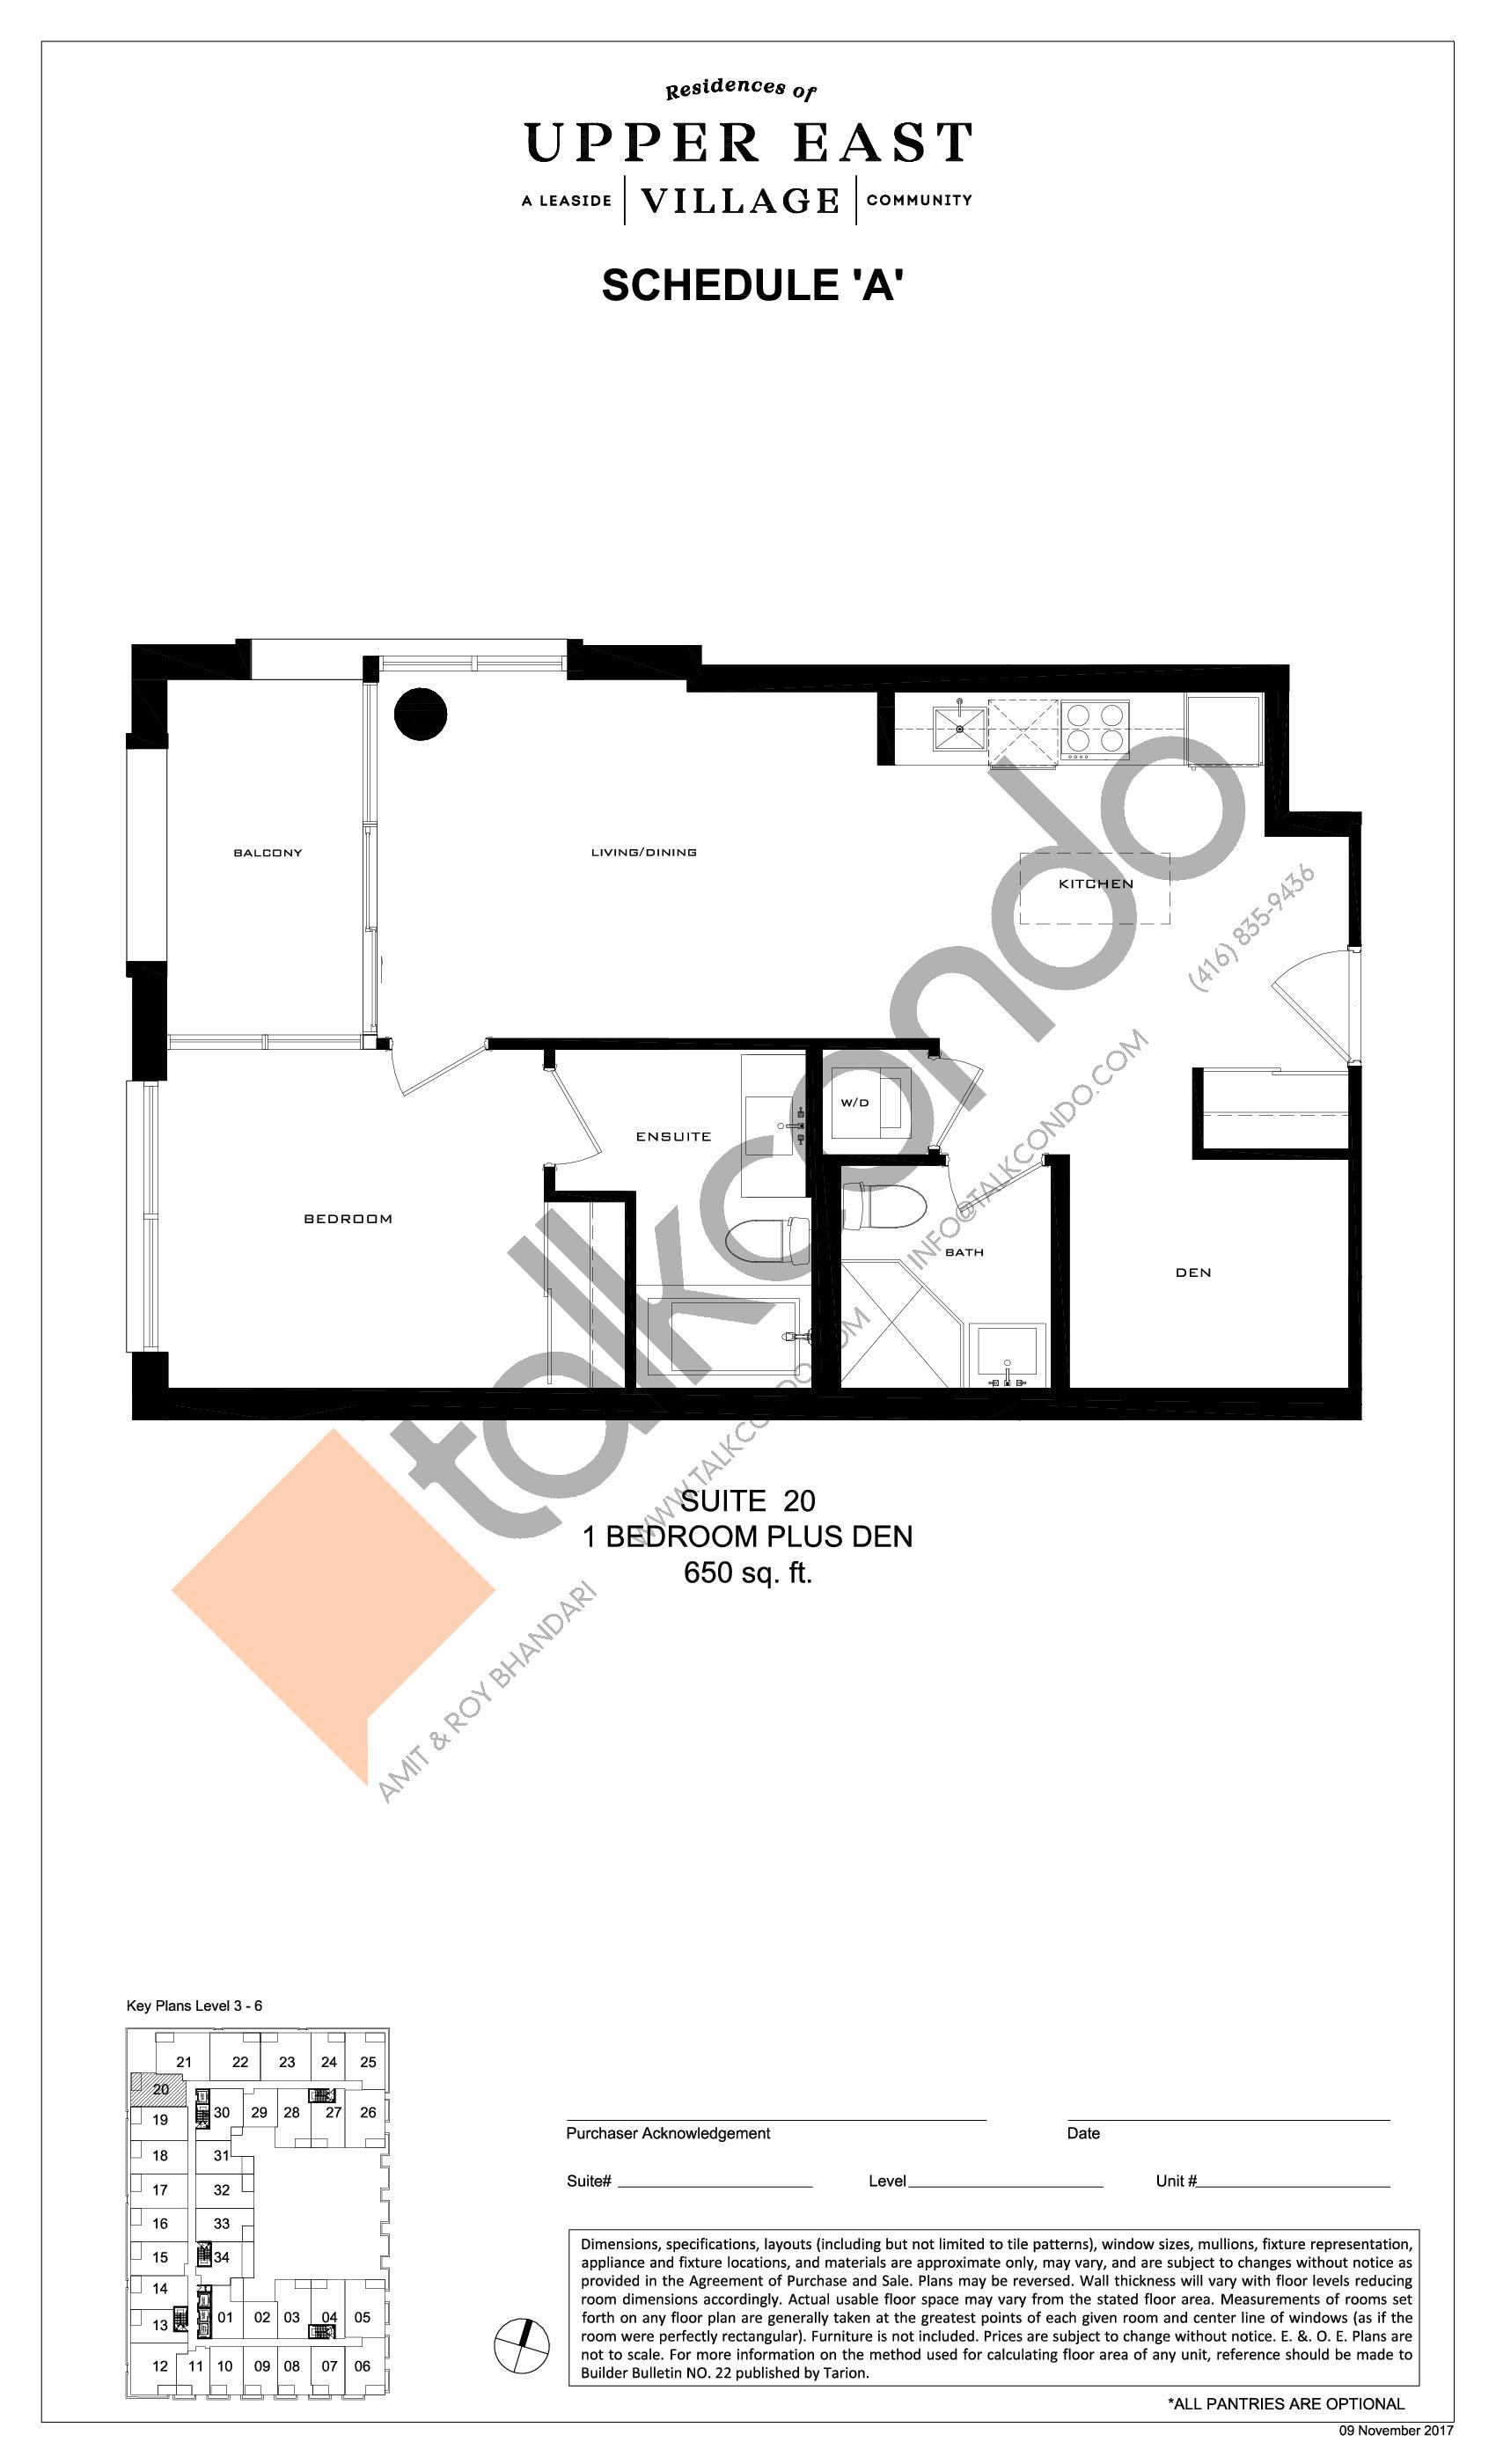 Suite 20 Floor Plan at Upper East Village Condos - 650 sq.ft